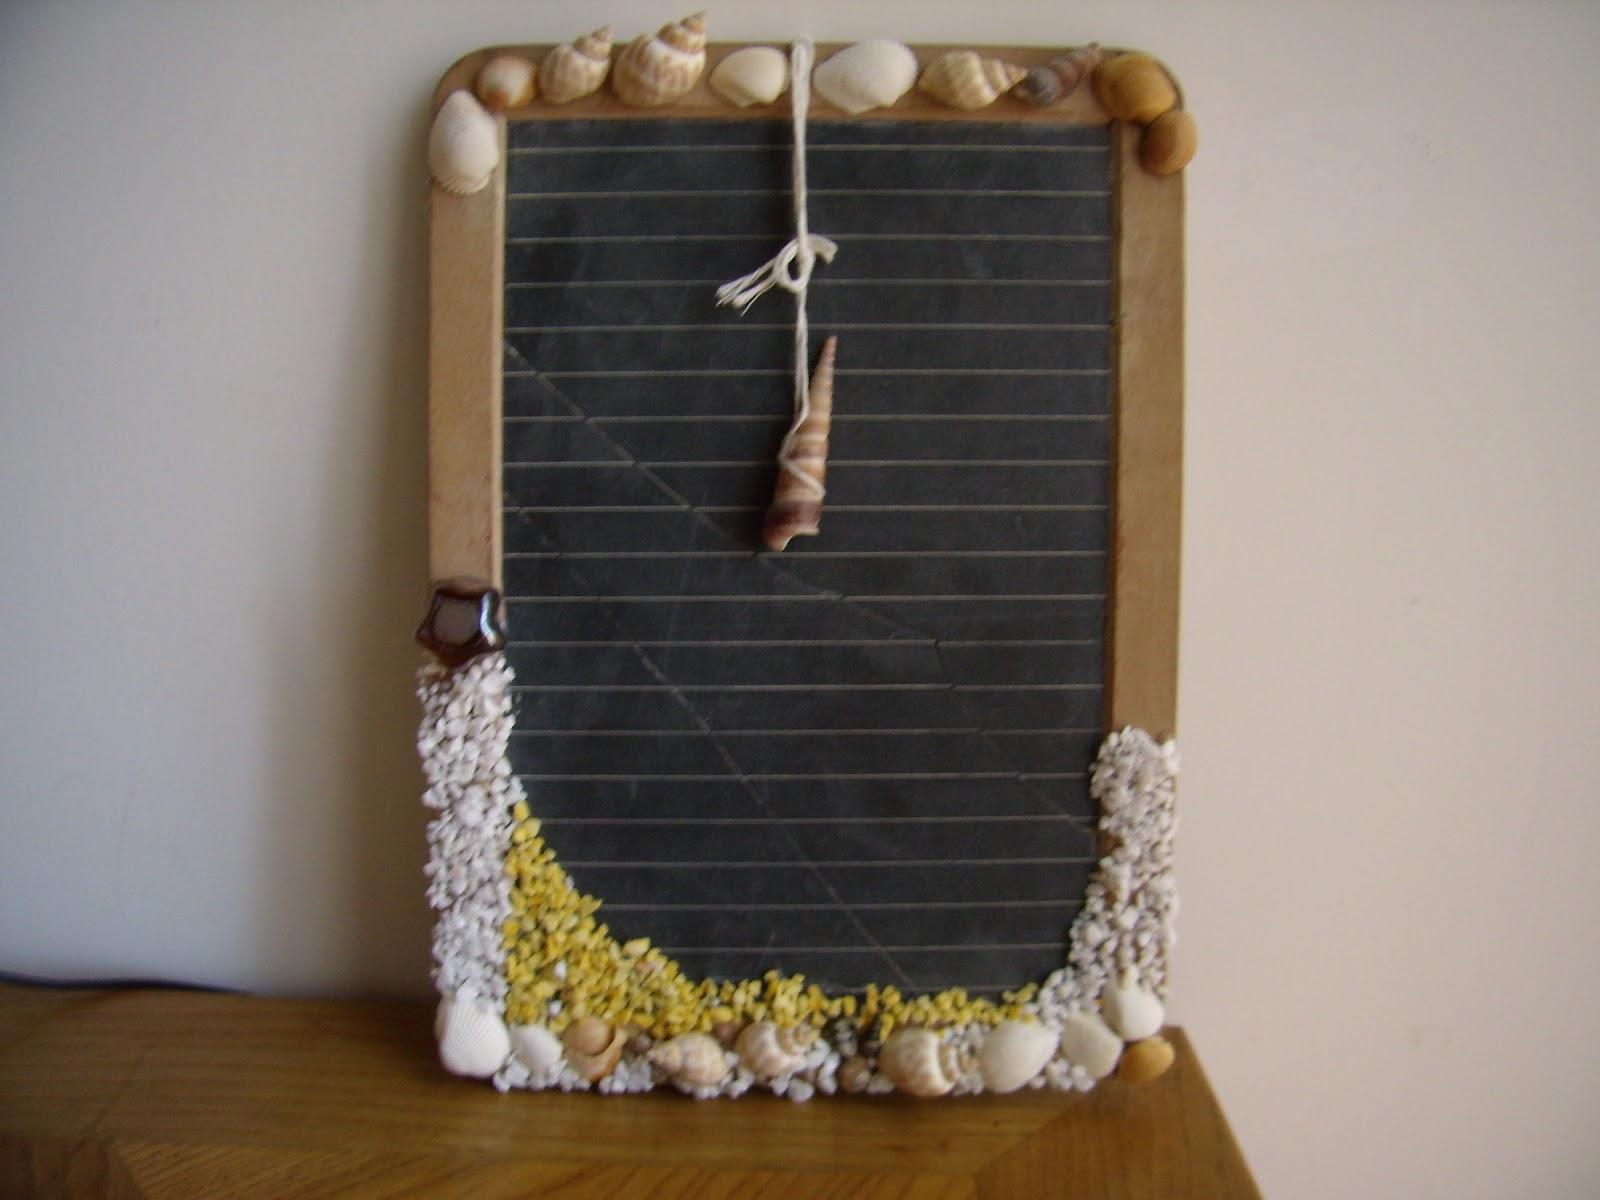 Lampade Decorate Con Conchiglie ~ dragtime for